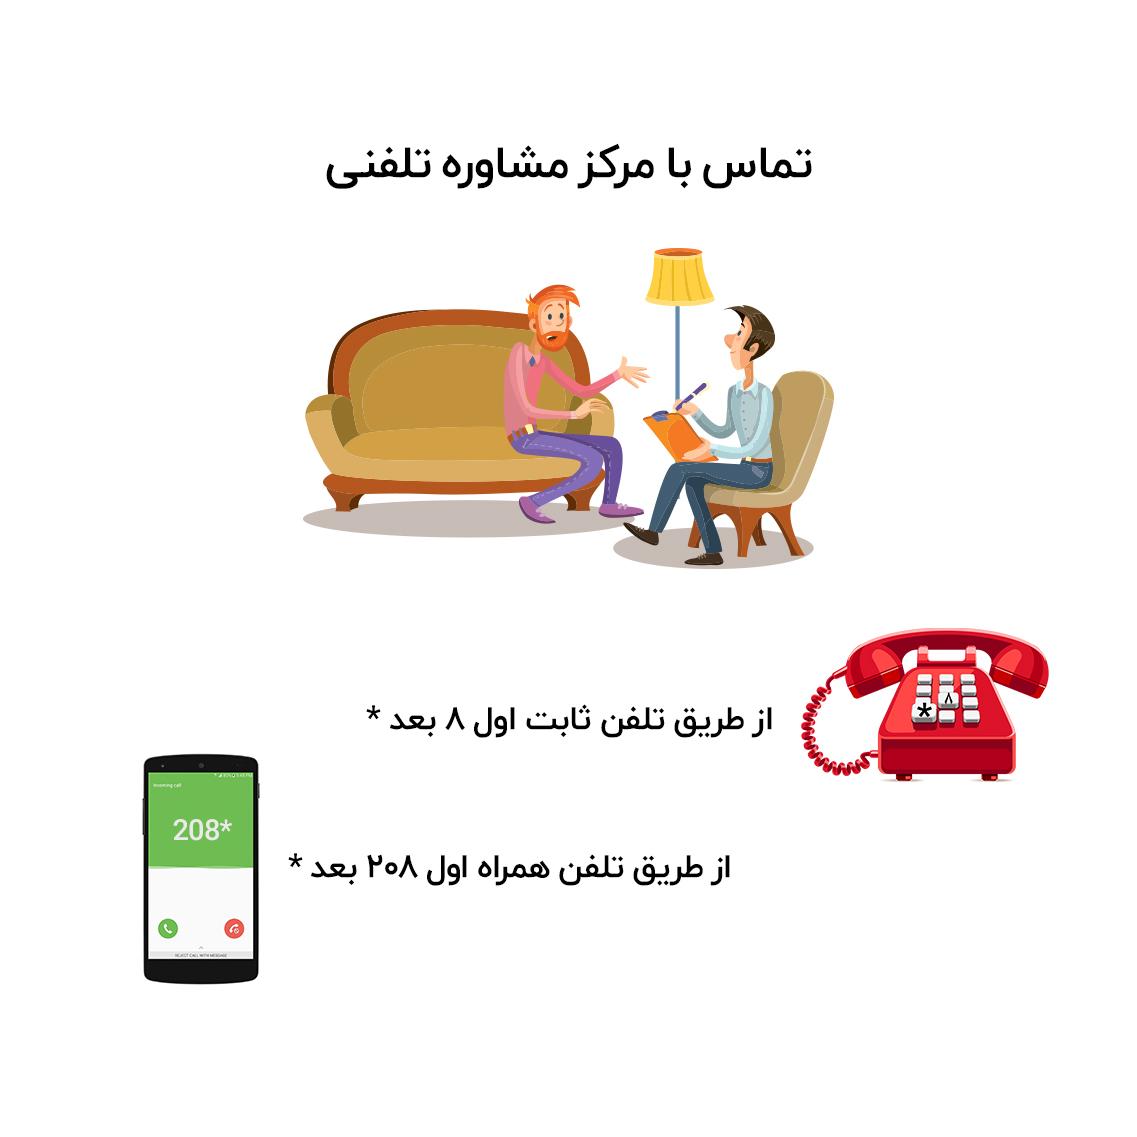 مشاوره تلفنی با موبایل